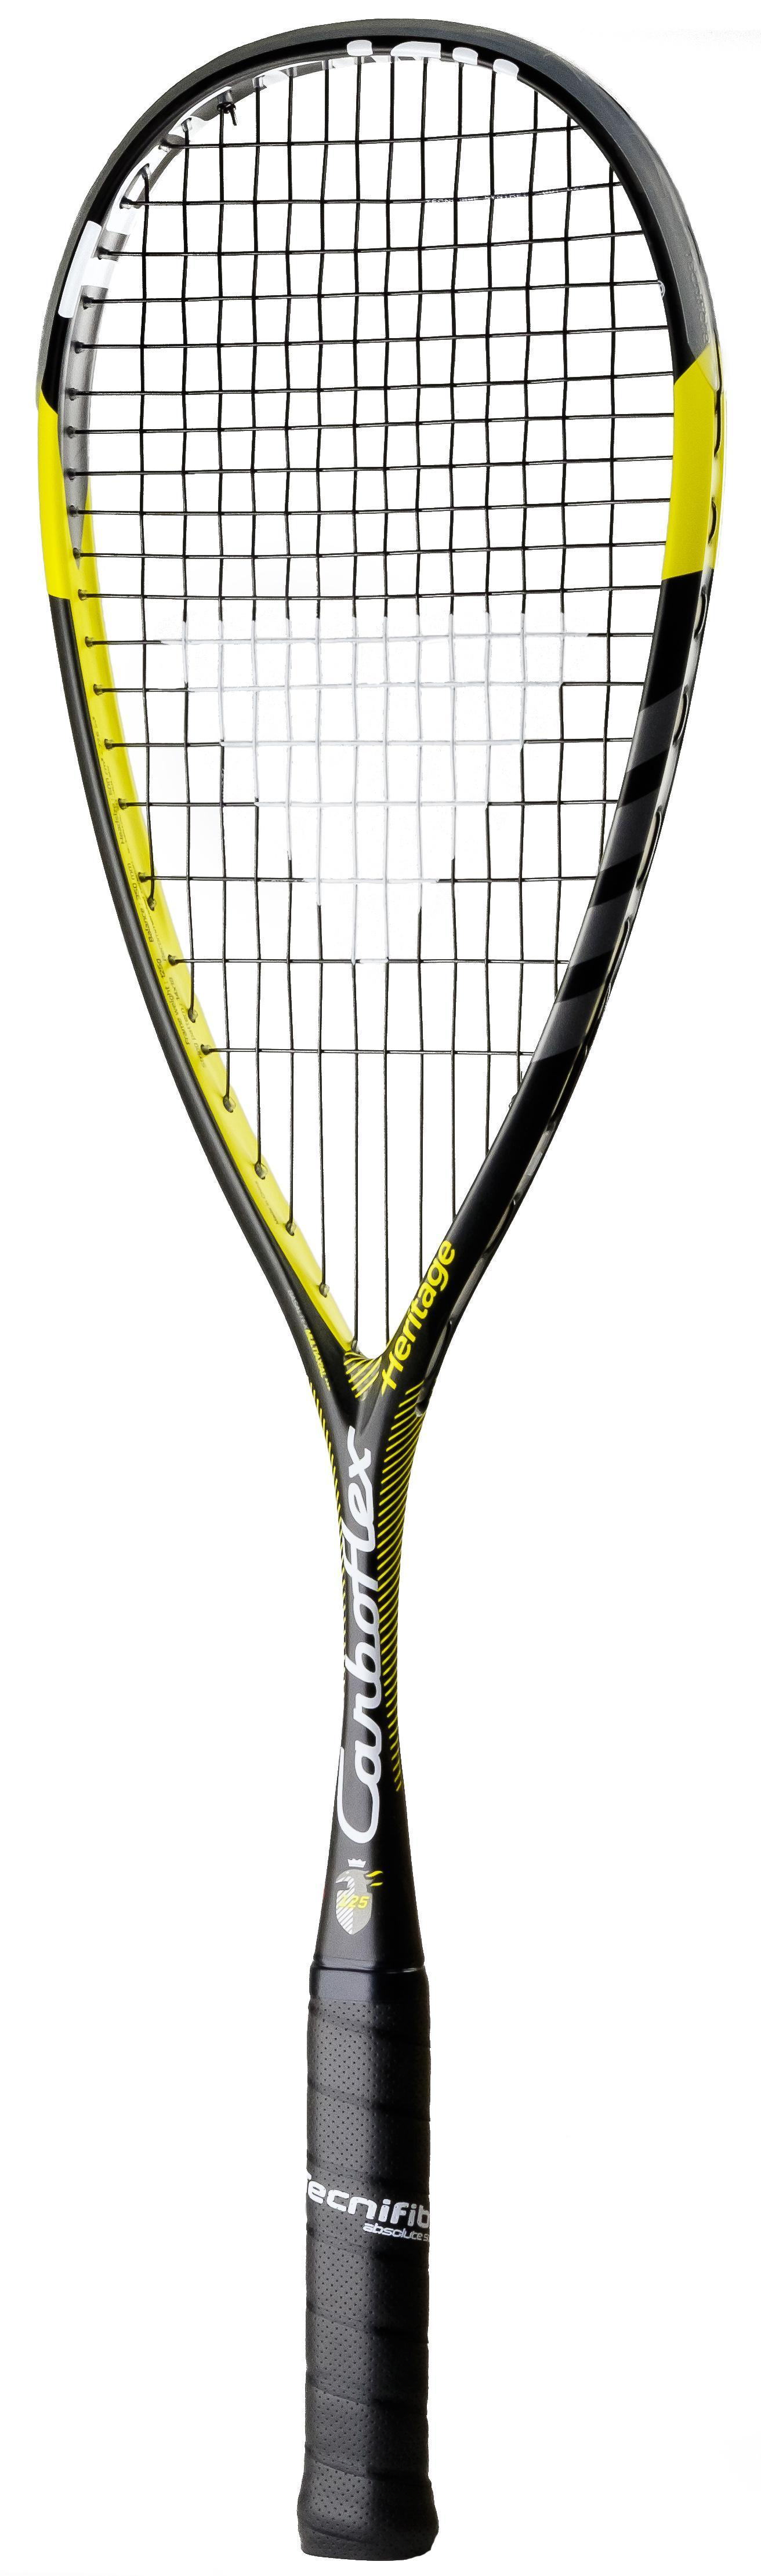 Free Delivery Karakal Black Zone 50 Badminton Racket rrp £44.99